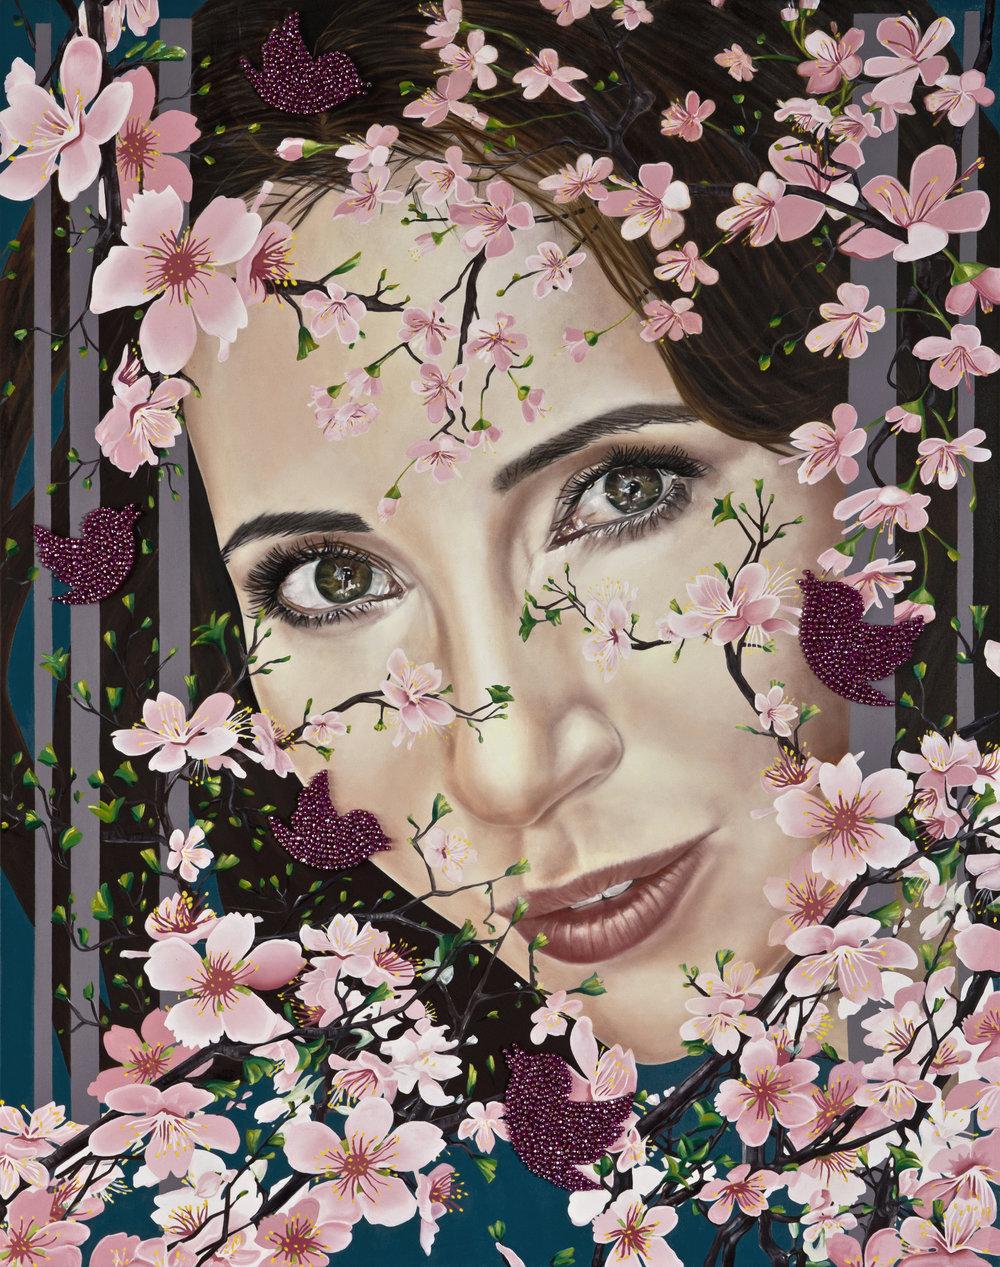 K,Portrait, 175x143 cm, oil & beads on canvas.jpg